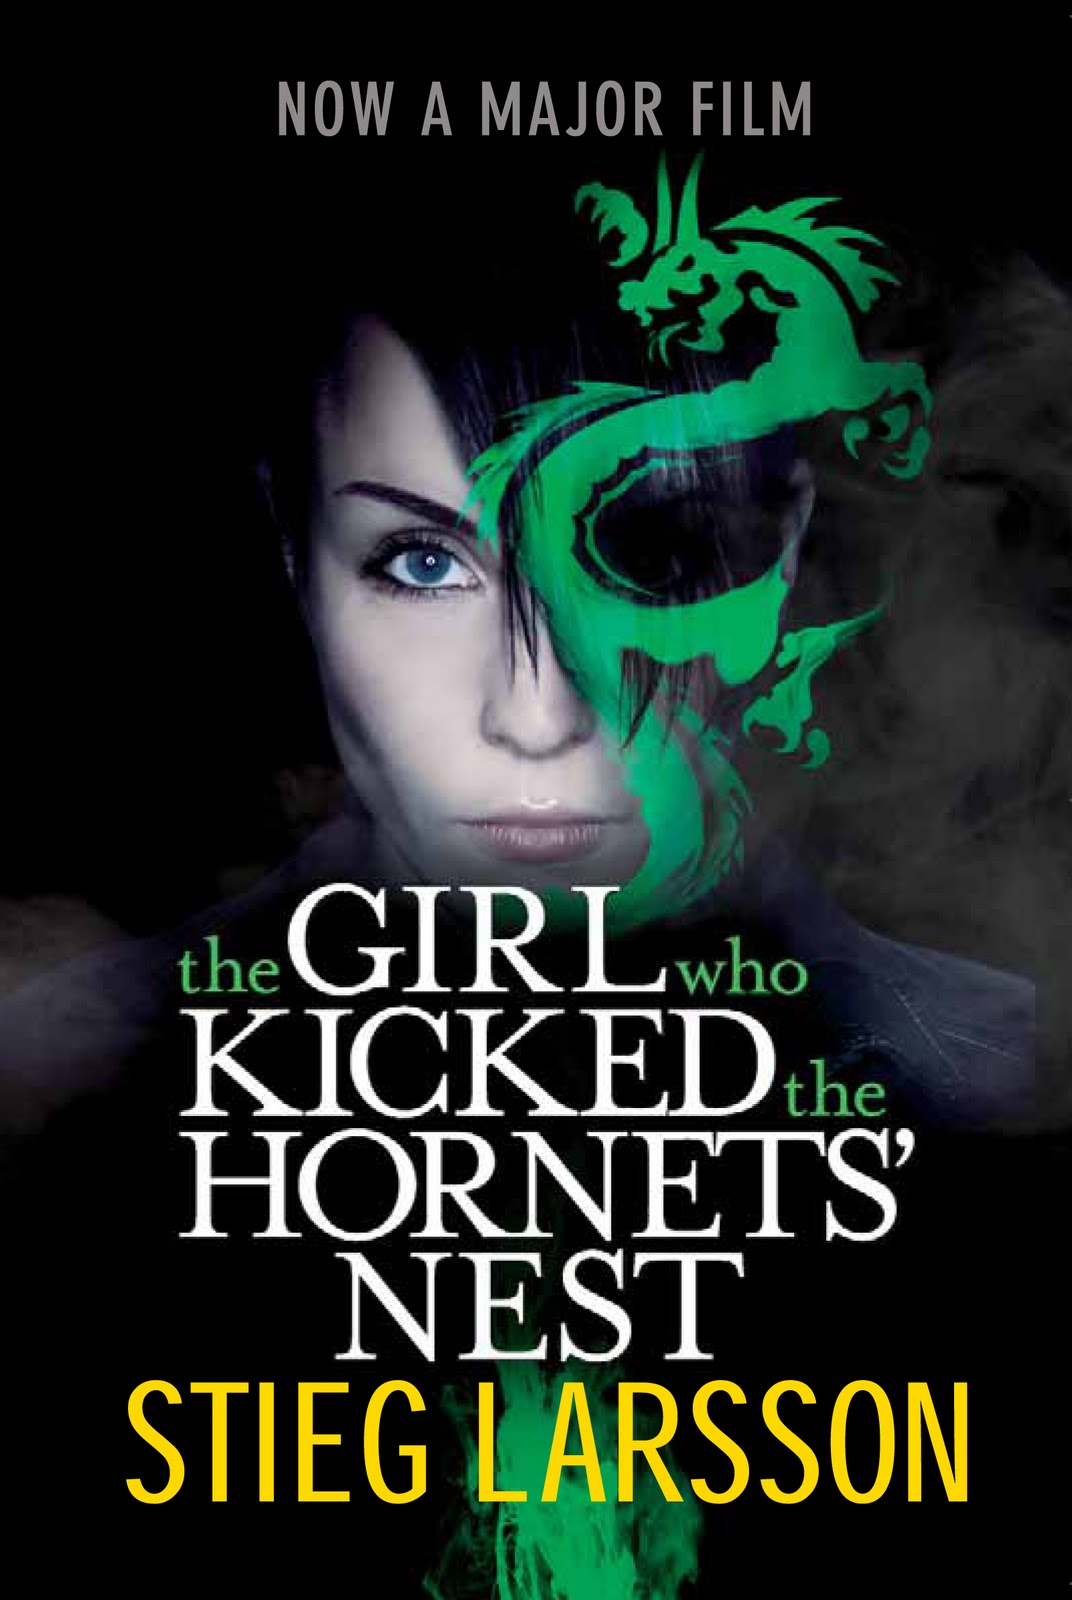 http://2.bp.blogspot.com/-uh9VgKUD_2A/TfH8zGj2HQI/AAAAAAAACbI/oBVkUvmPWKg/s1600/The+Girl+Who+Kicked+the+Hornets%2527+Nest.jpg